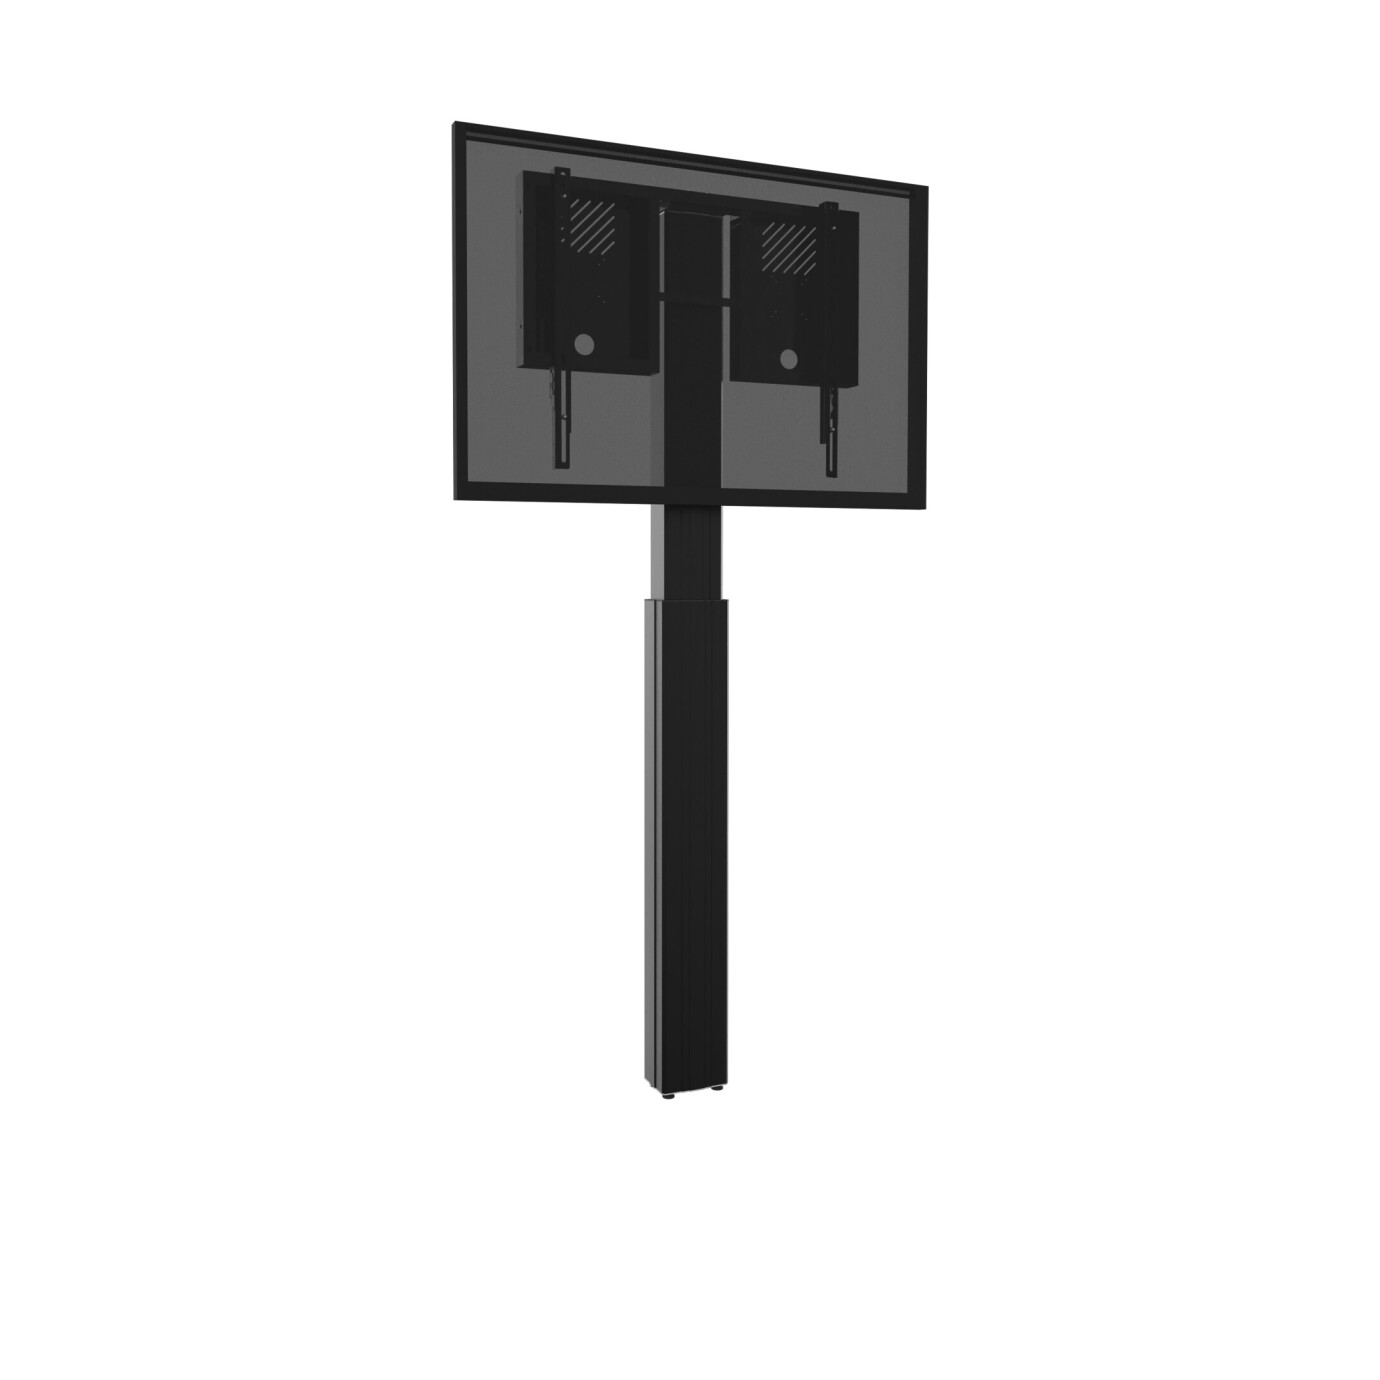 celexon Expert soporte para displays motorizado ajustable en altura Adjust-4275PB - 50 cm